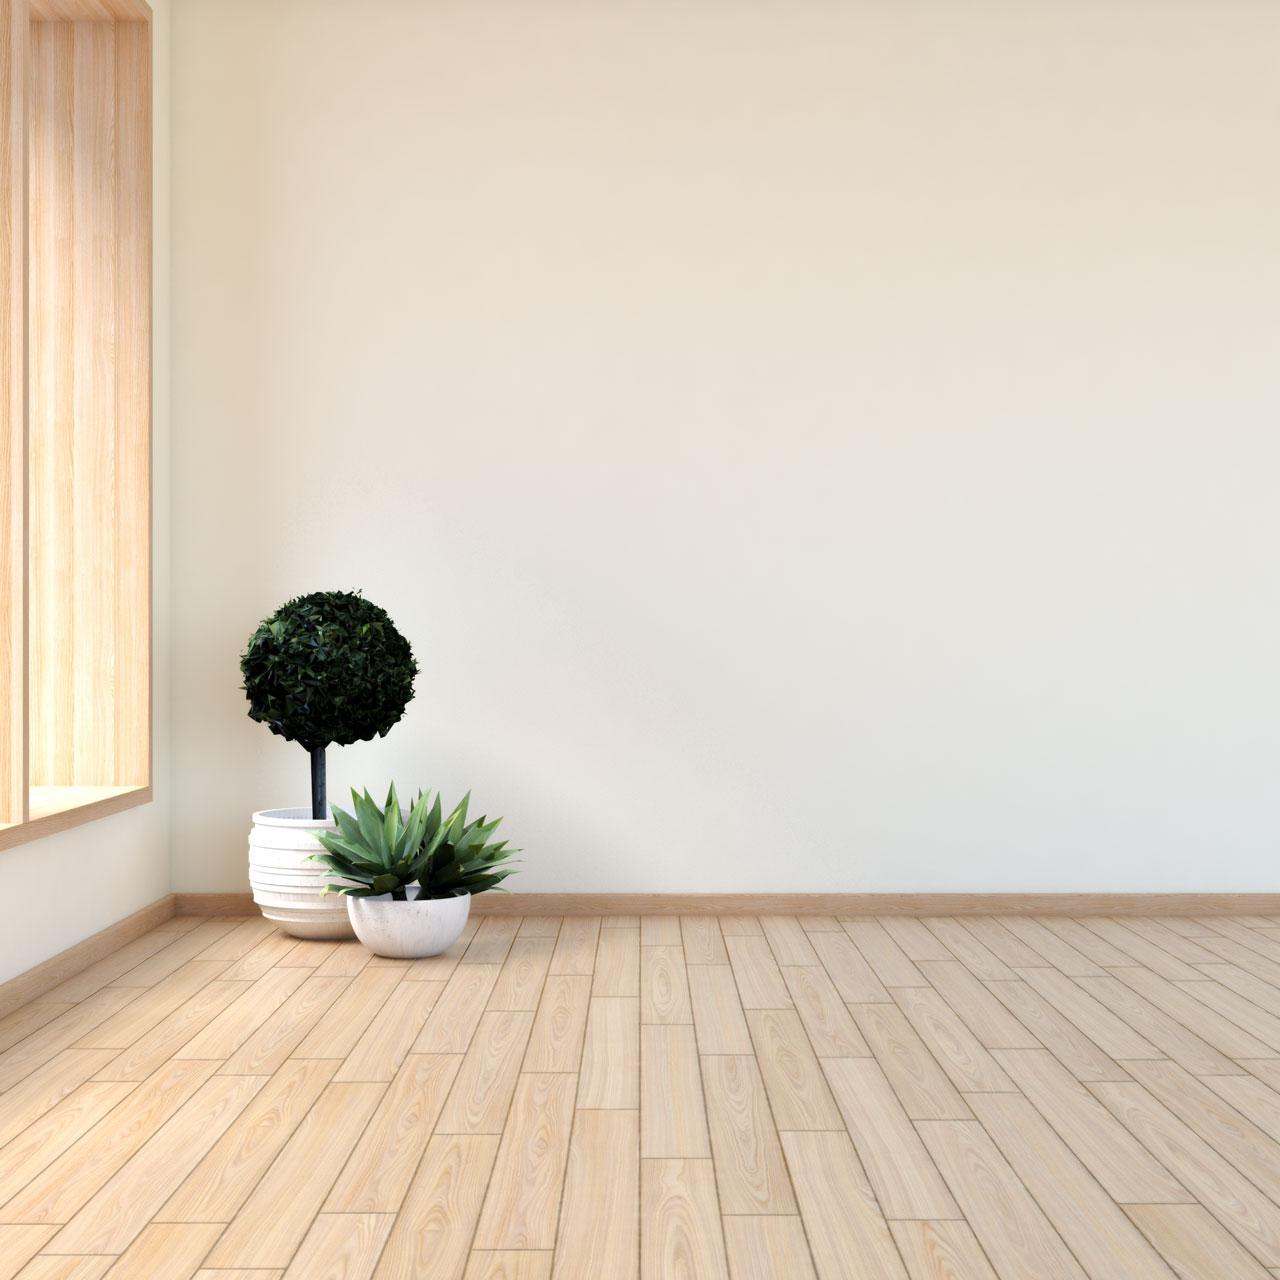 Cream walls with natural wood flooring